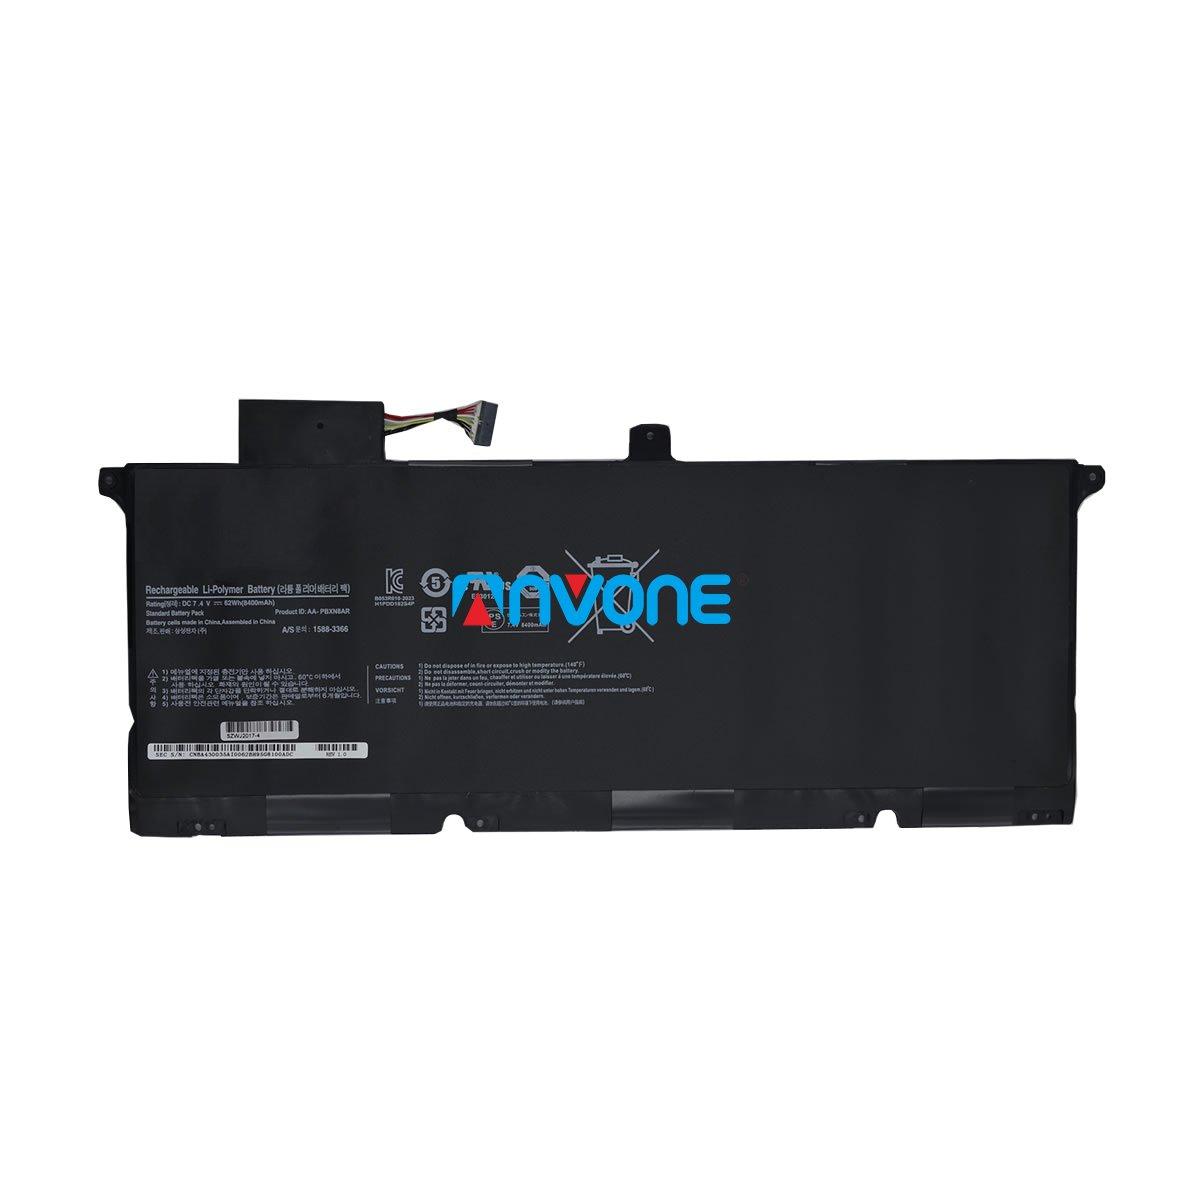 AA-PBXN8AR Battery Samsung 900X4D-A01 900X4D-A02 900X4D-A03 Battery